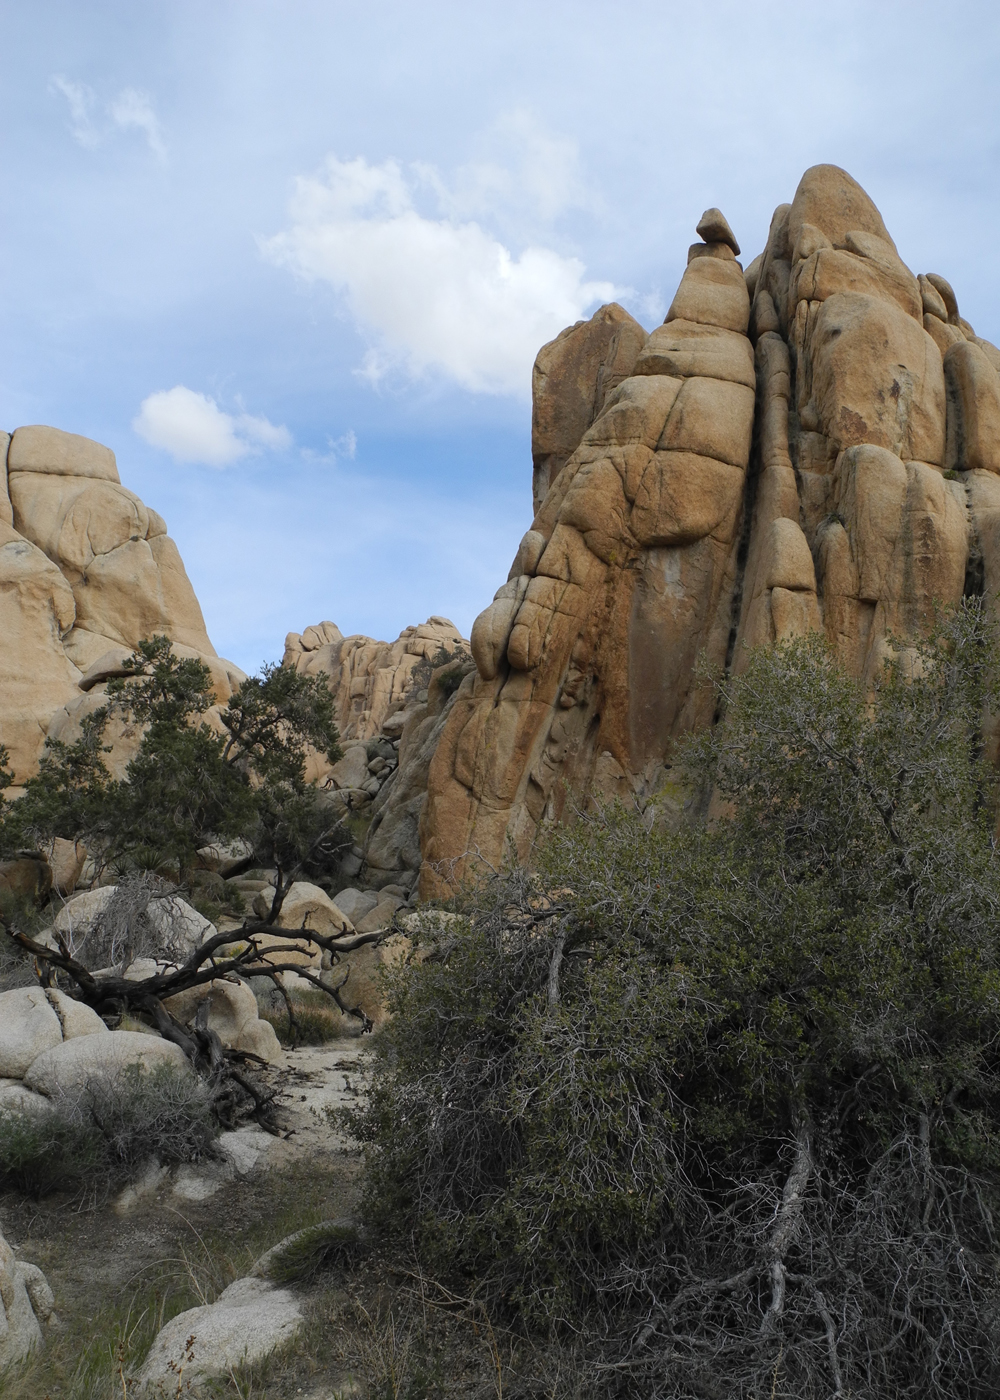 Backpack Joshua Tree California Sierra Club Outings